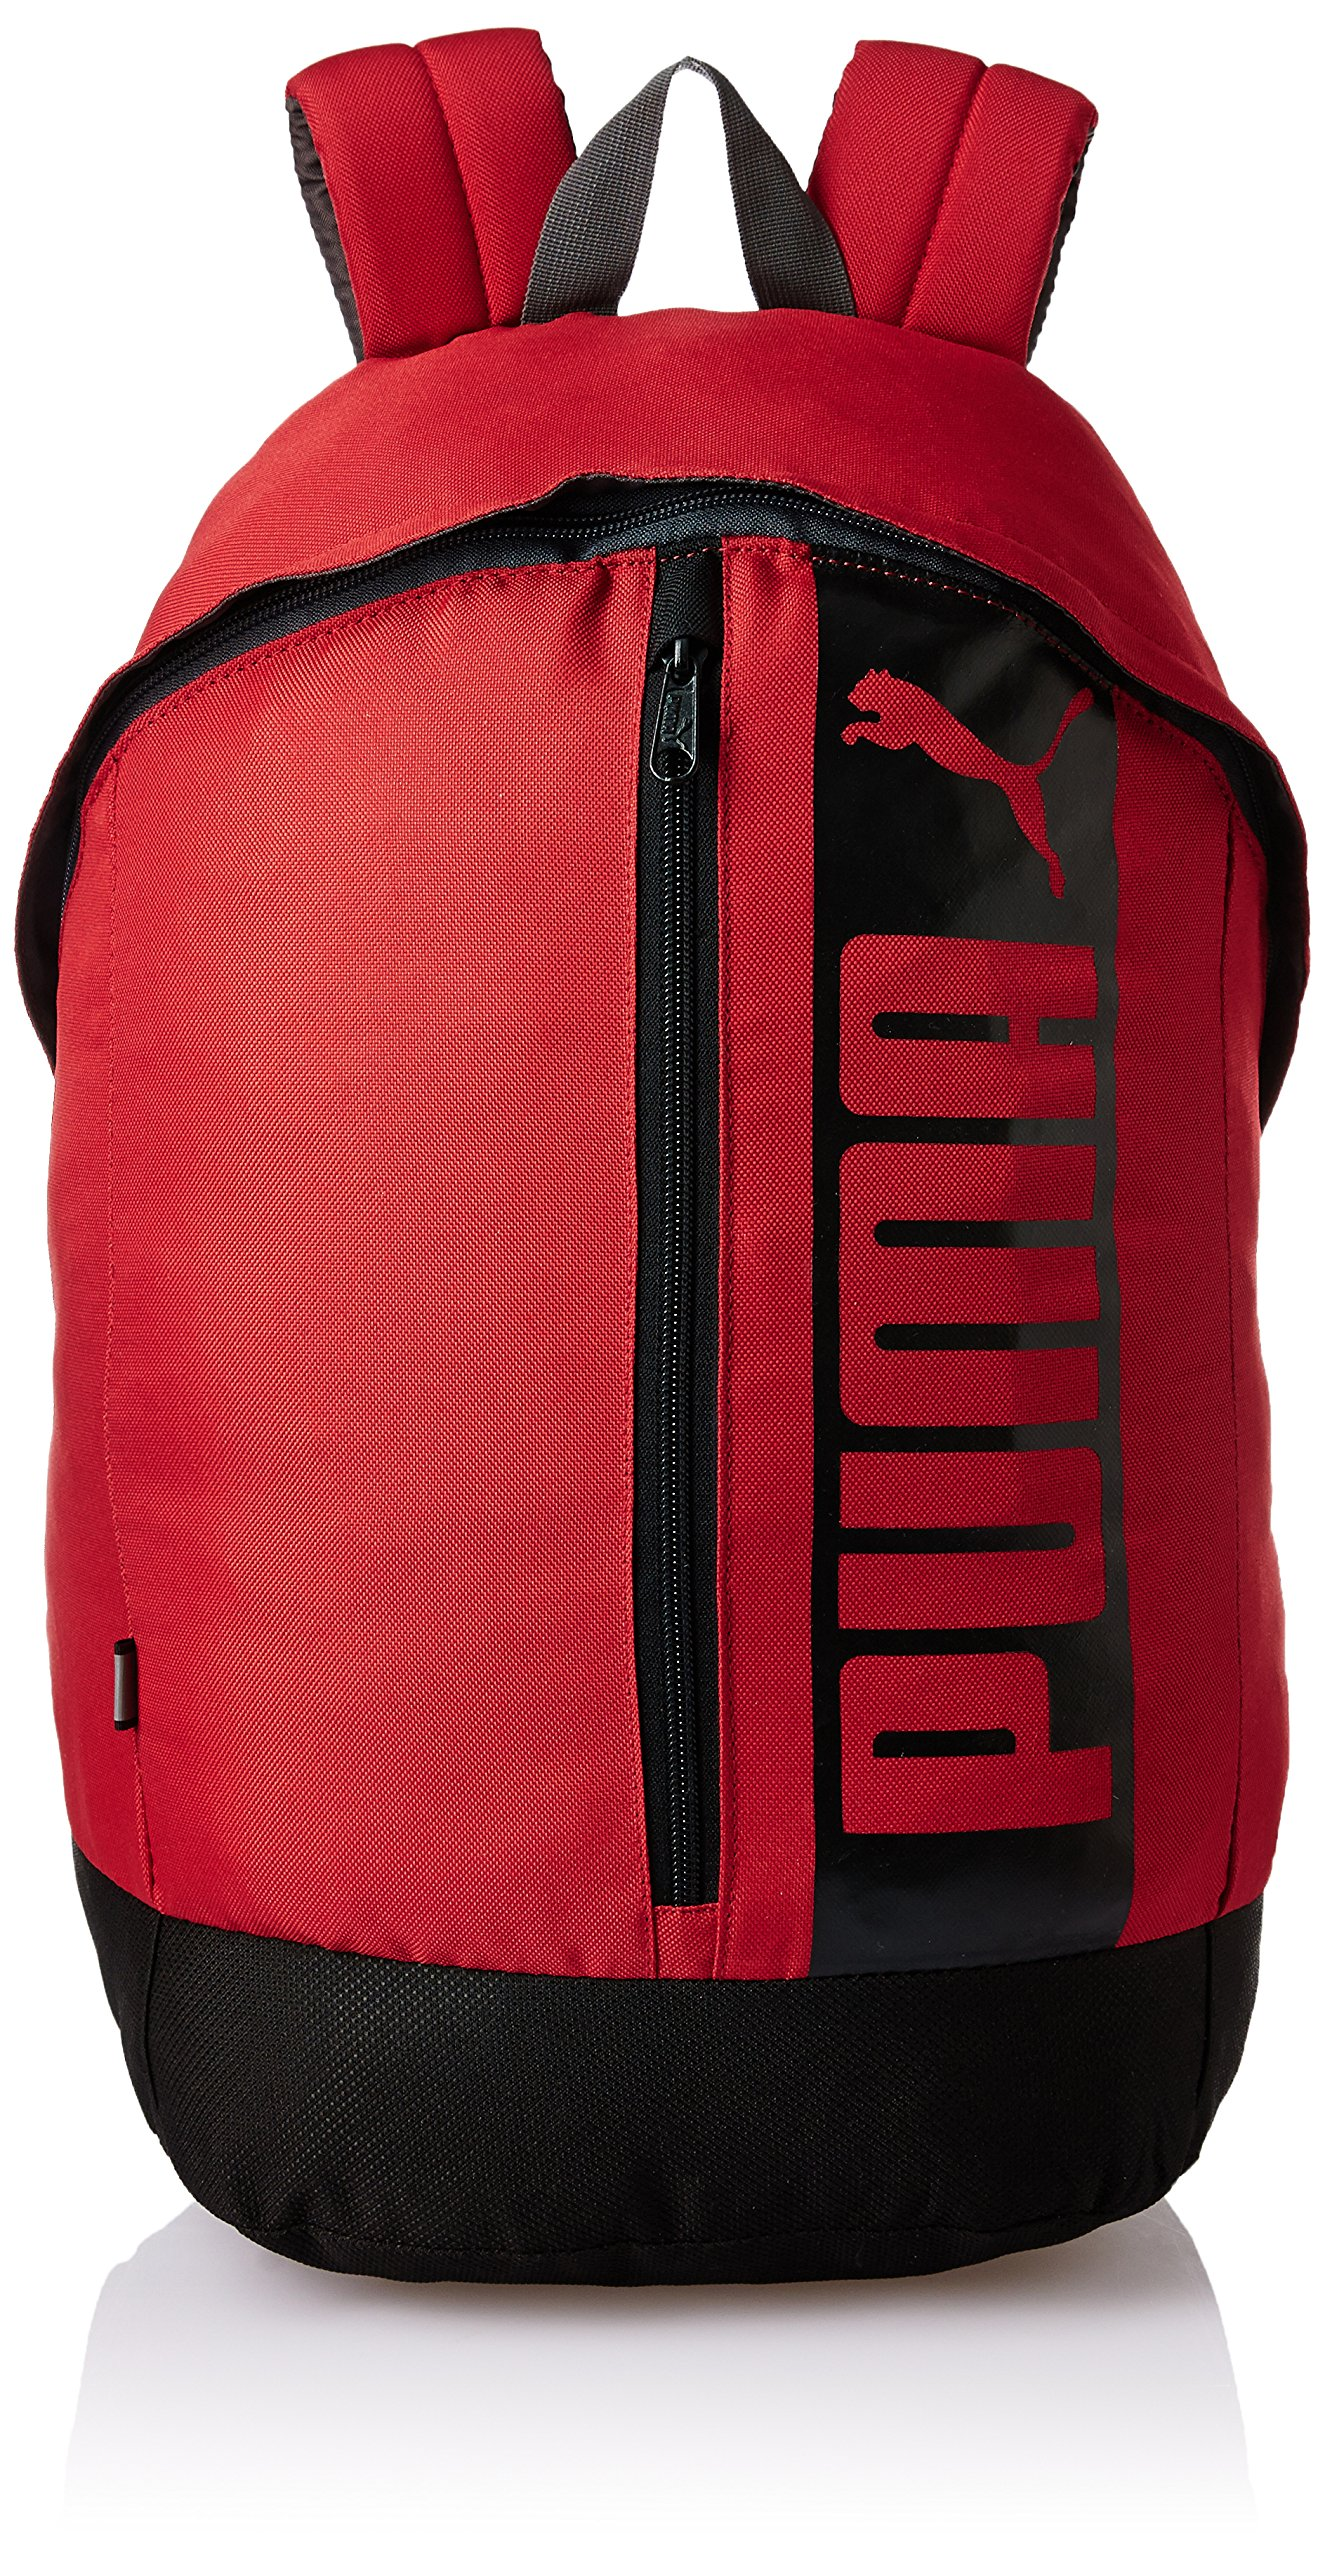 91AsL2pWKdL - Puma Pioneer Backpack II-Mochila